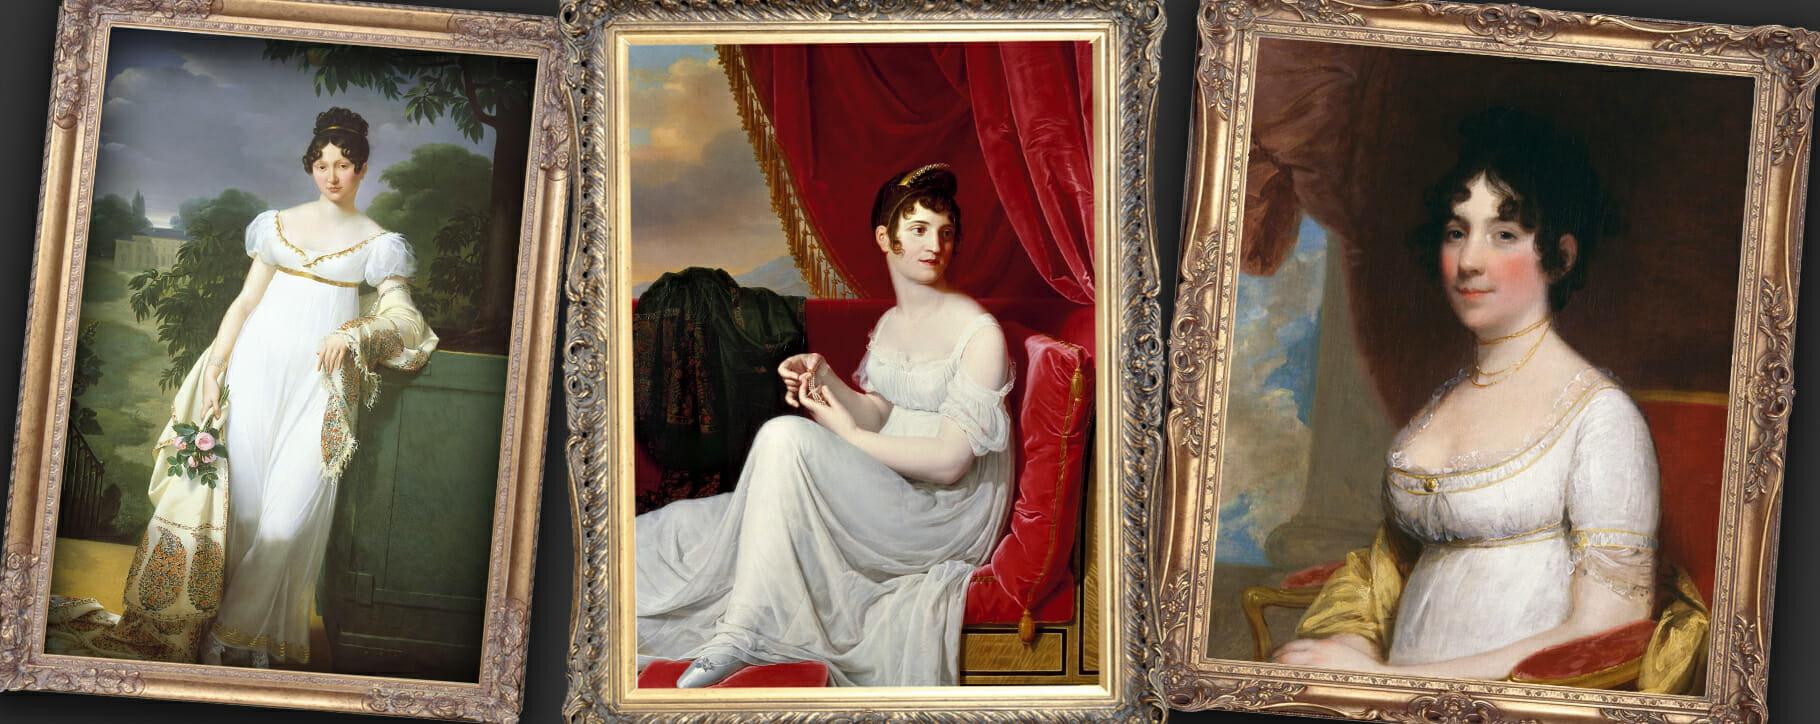 Regency Fashion Portraits